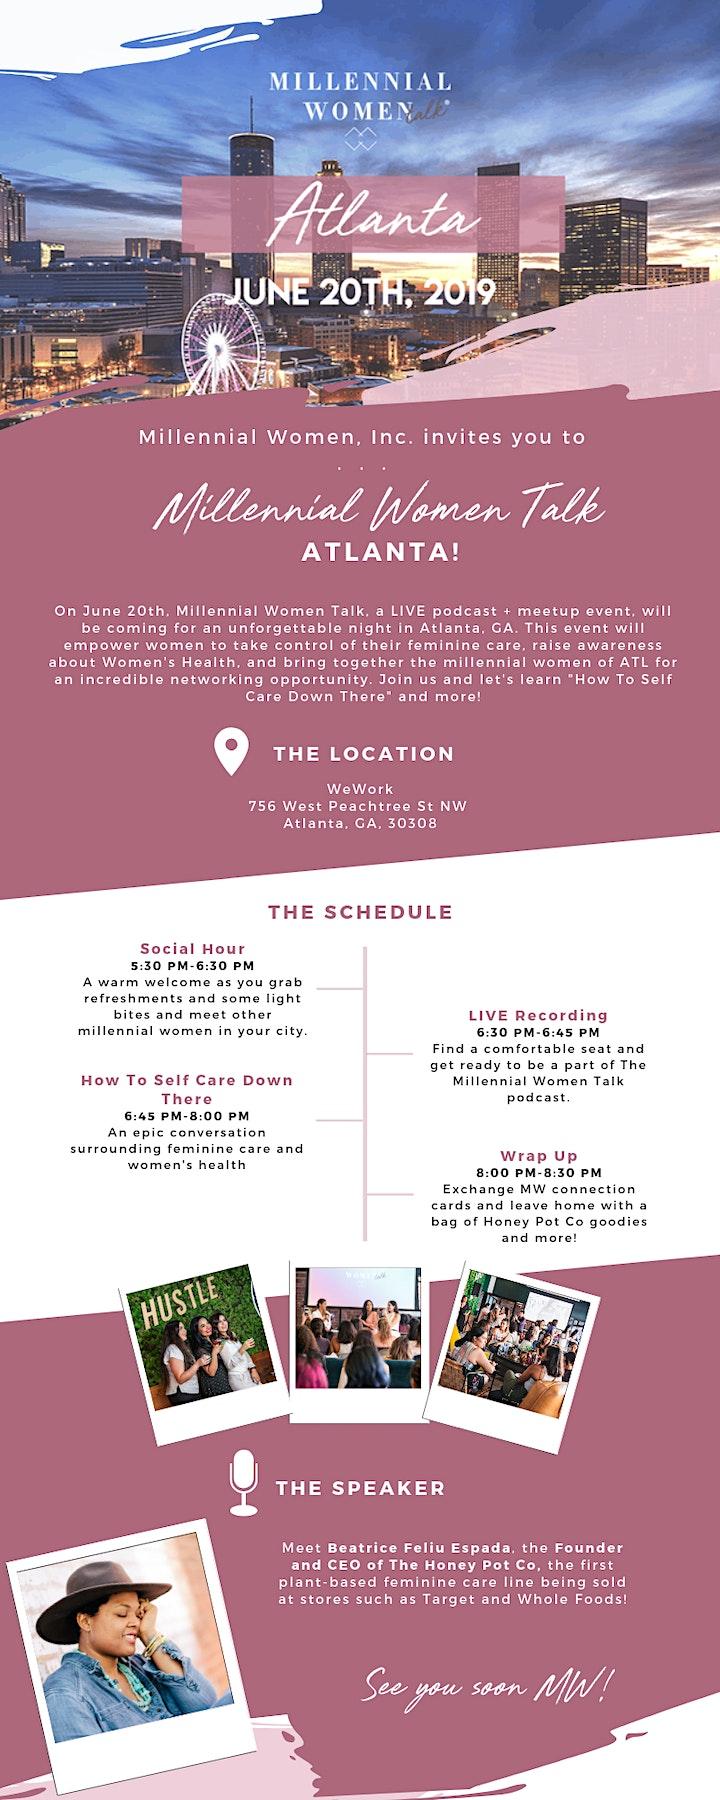 Millennial Women Talk, a LIVE podcast + meet-up in Atlanta, GA! image